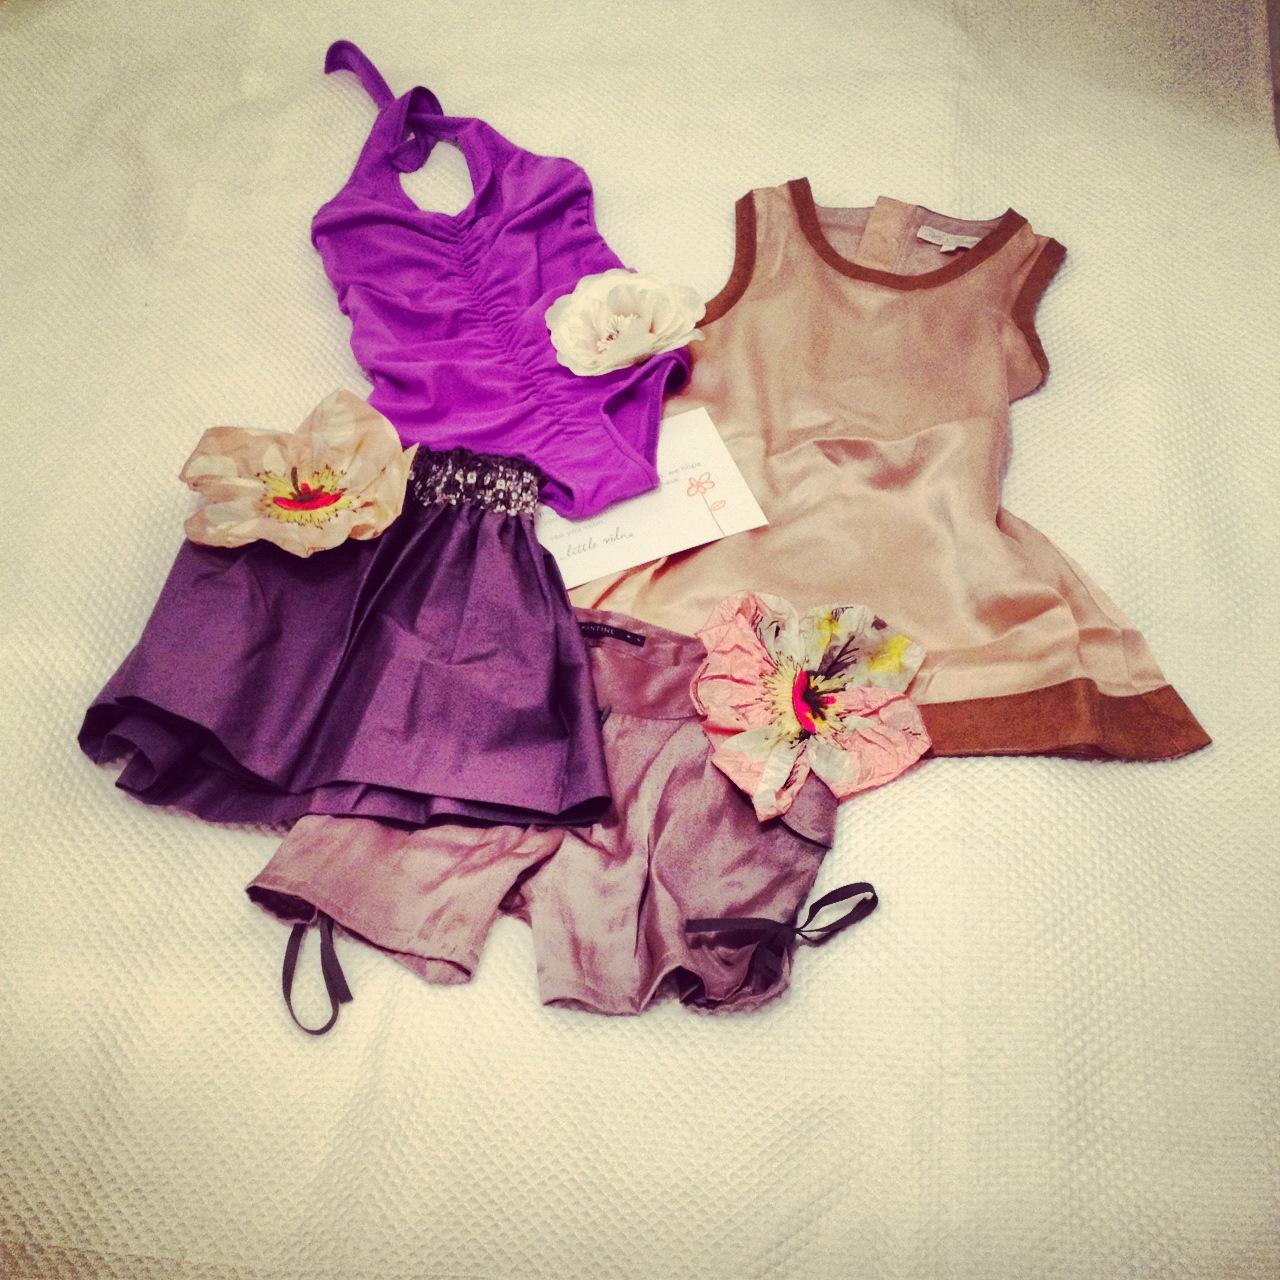 clothes by little vida NY